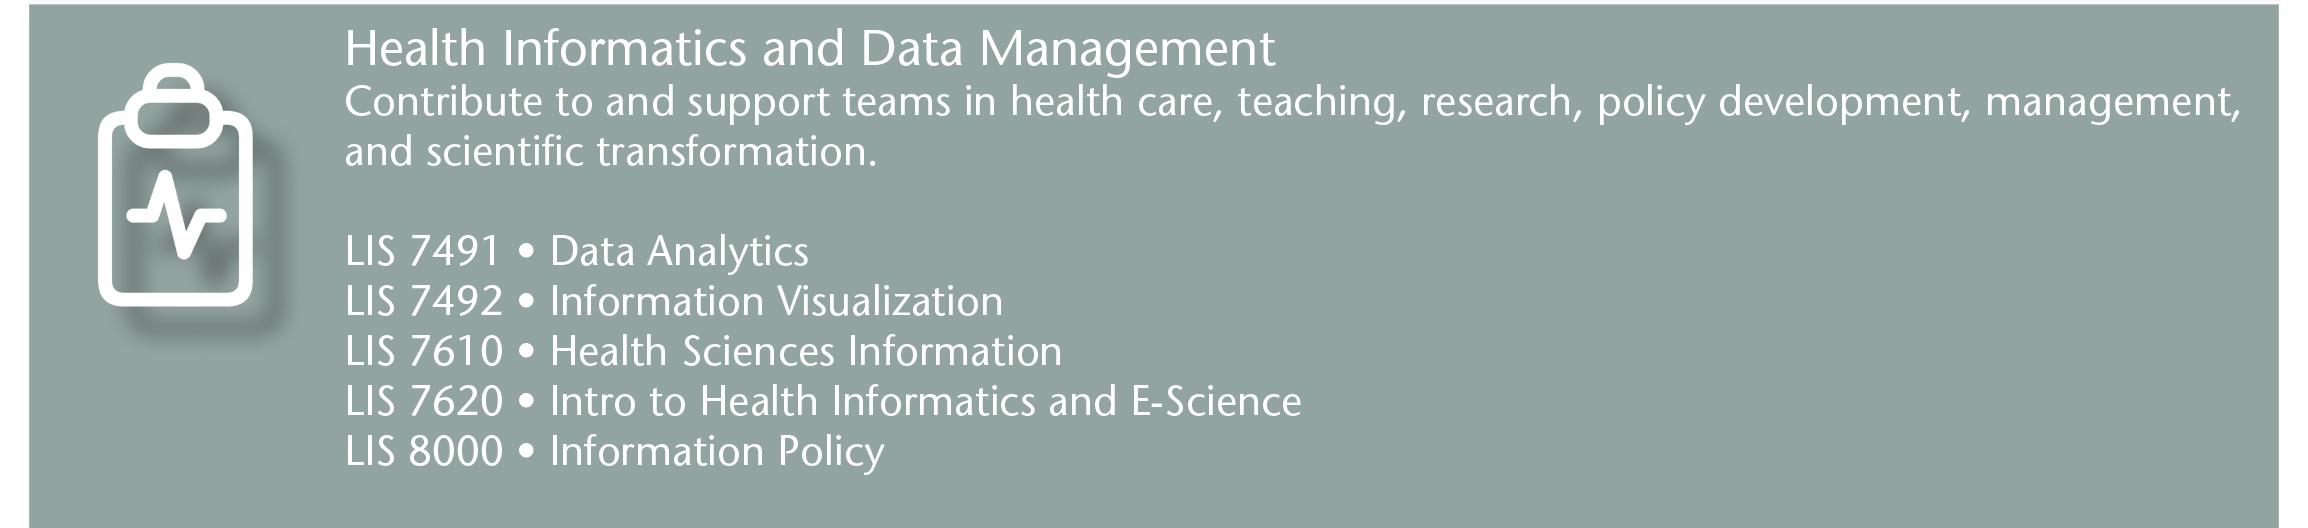 School of information sciences wayne state university software tools web based info services health informatics xflitez Choice Image